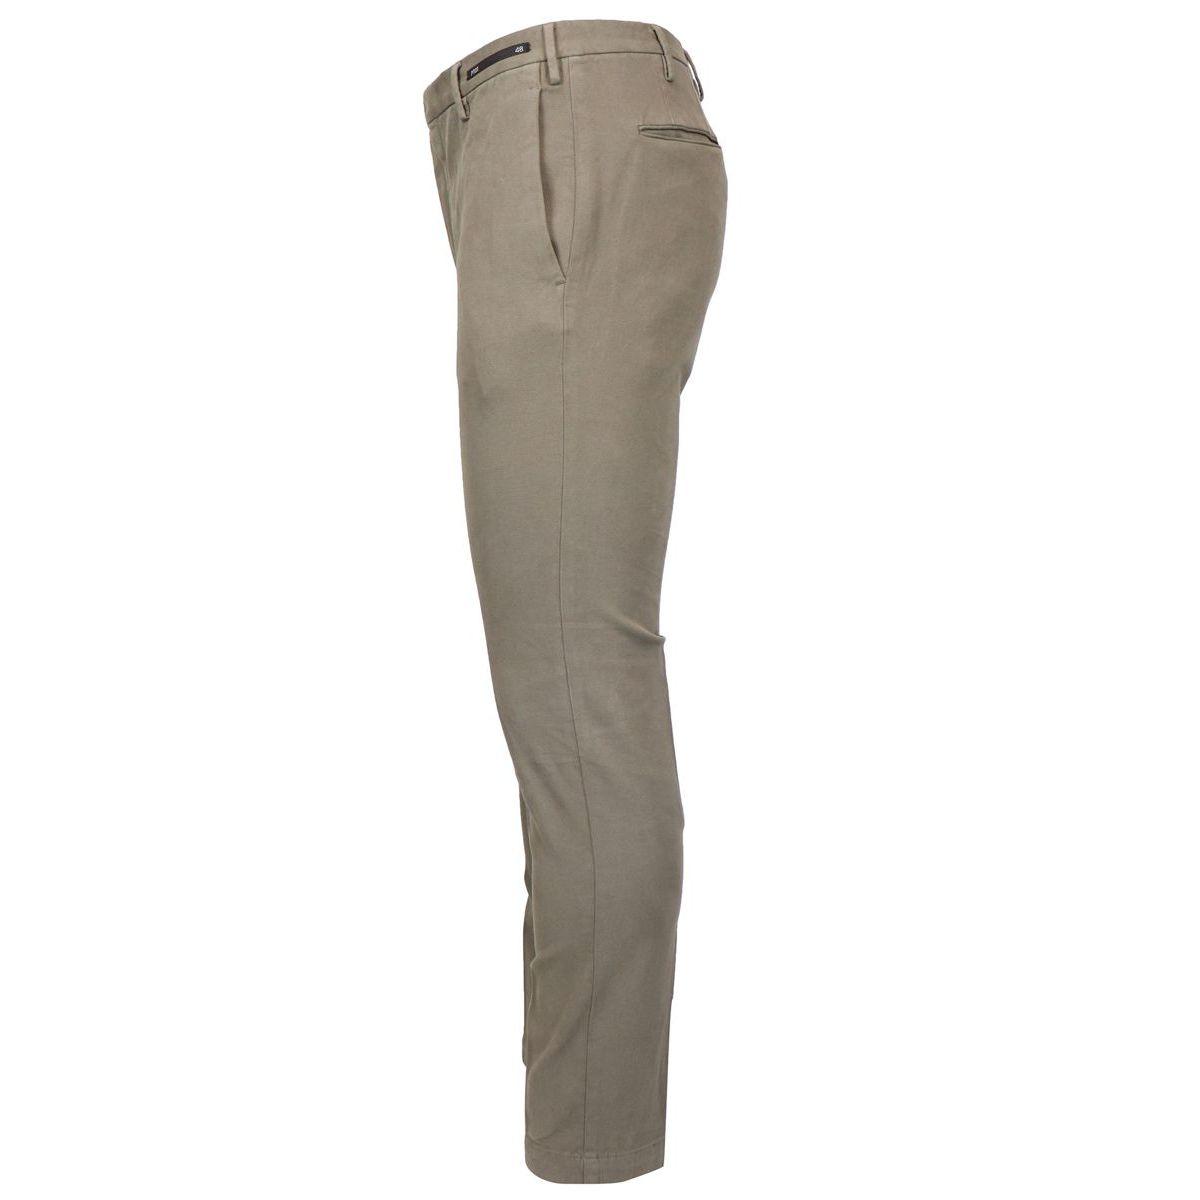 Solid color cotton skinny pants Mud PT01